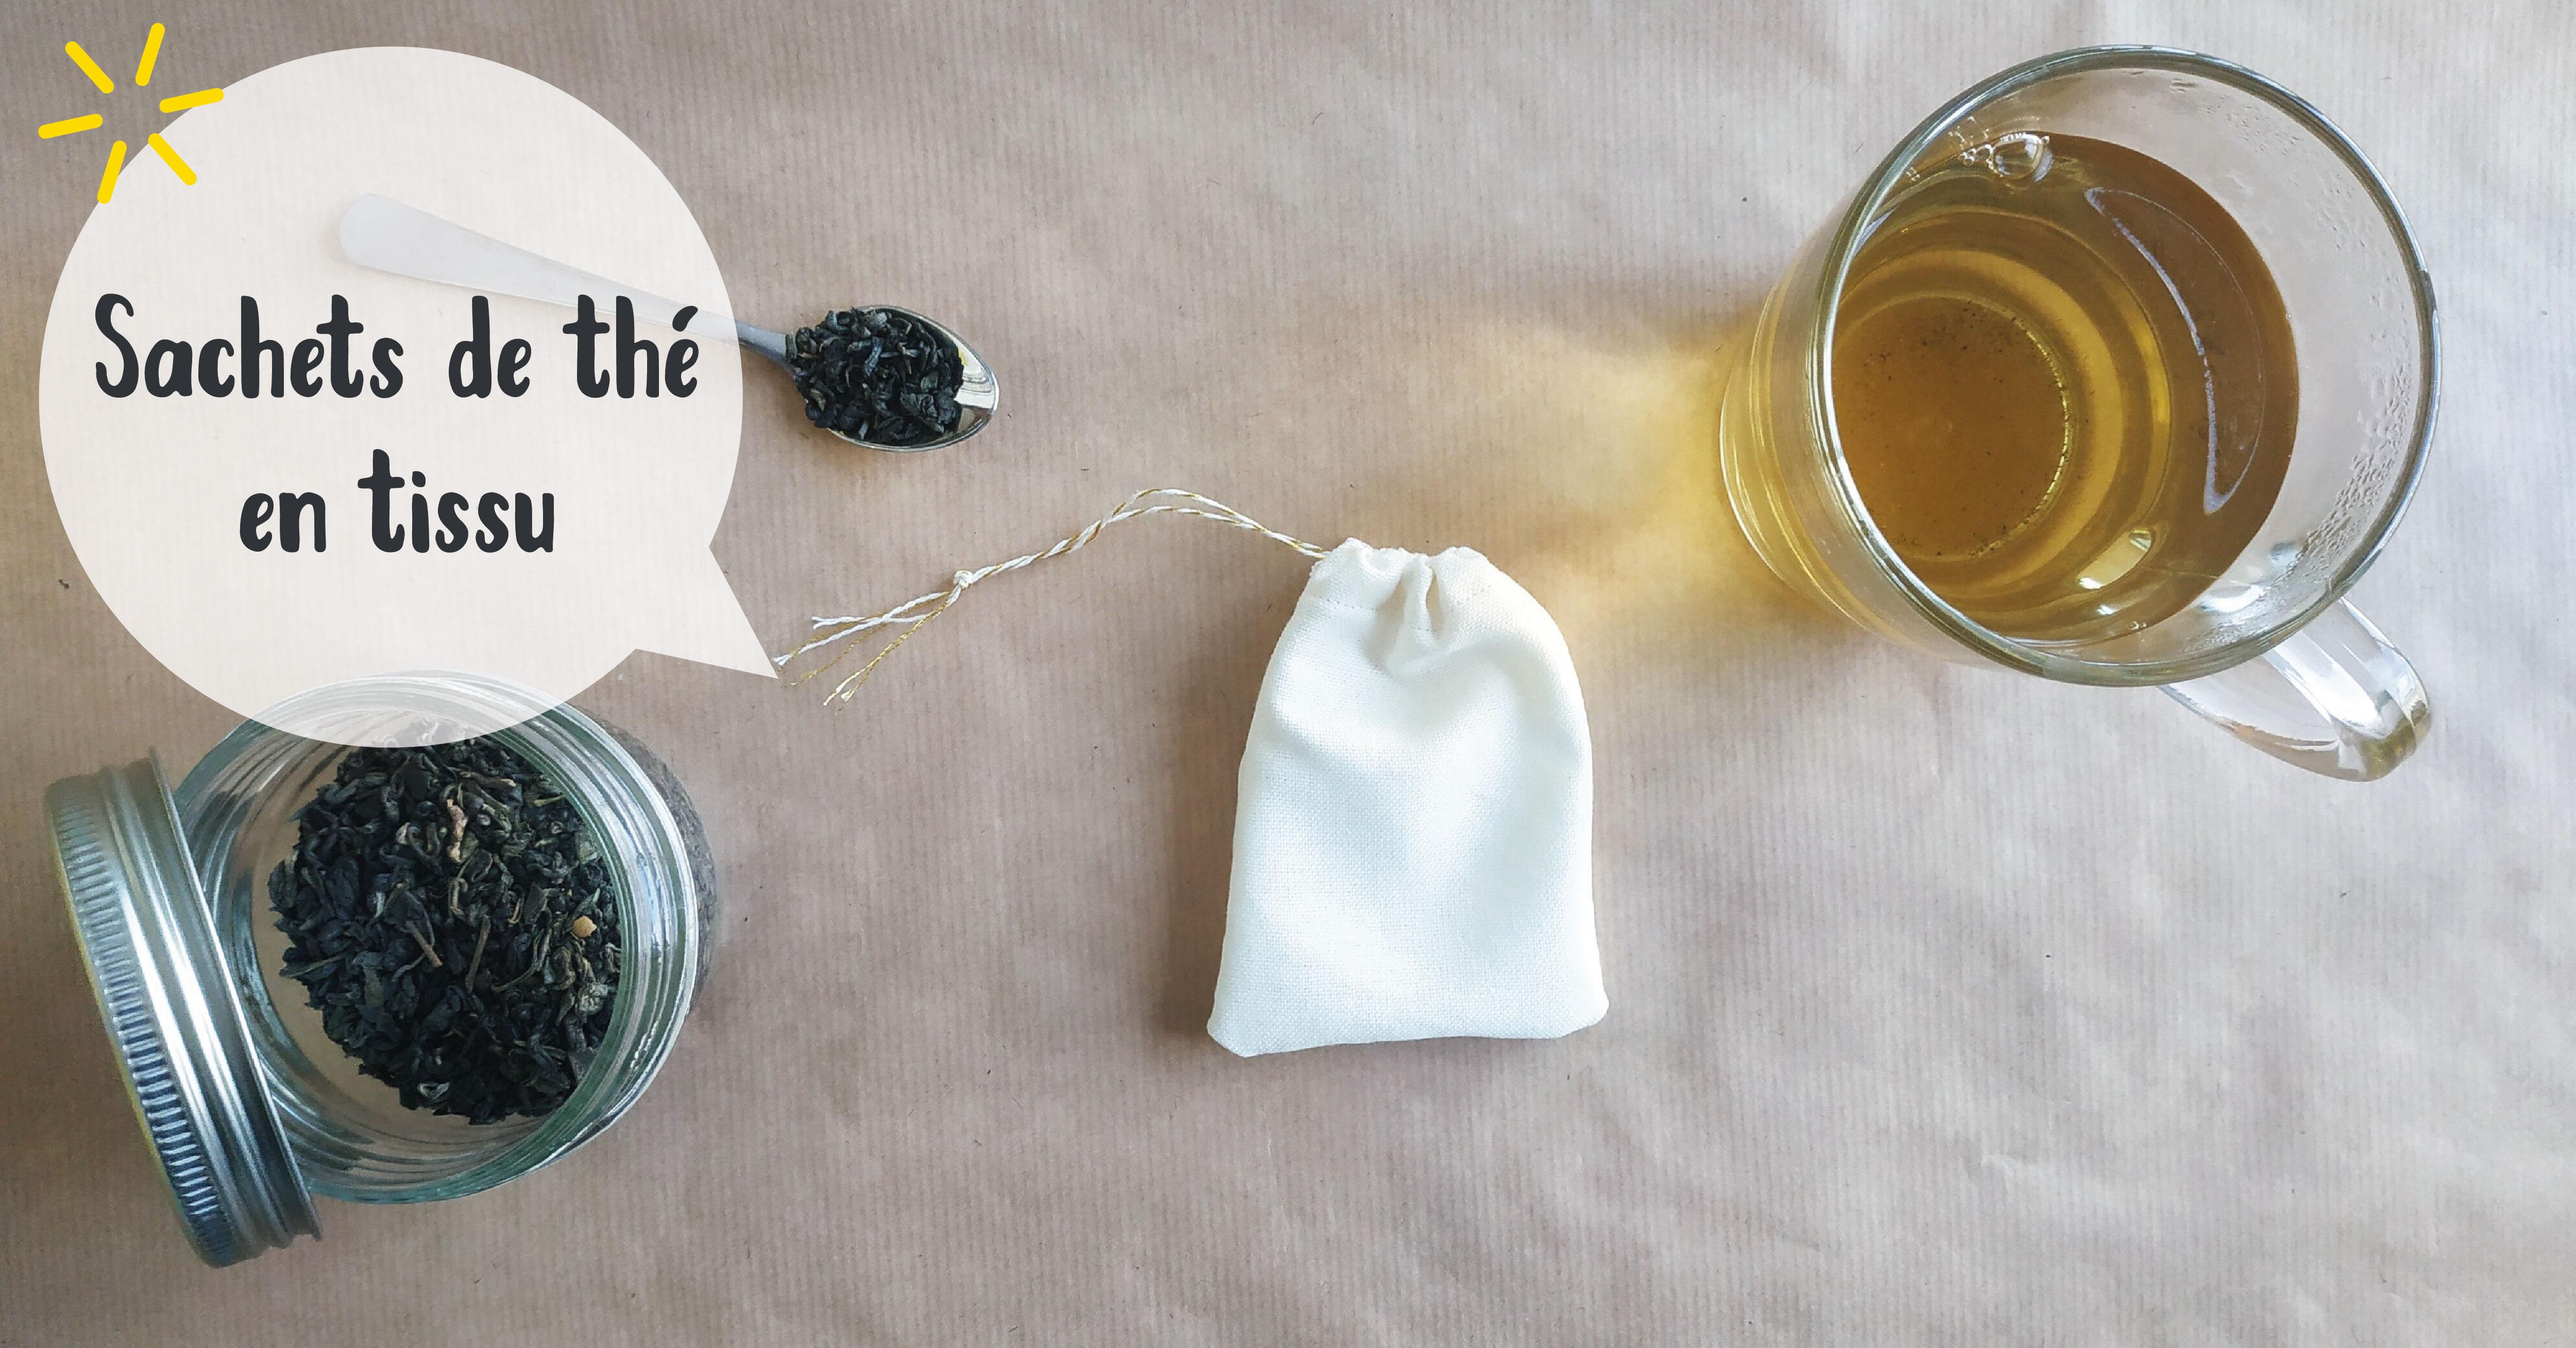 Sachet de thé en tissu